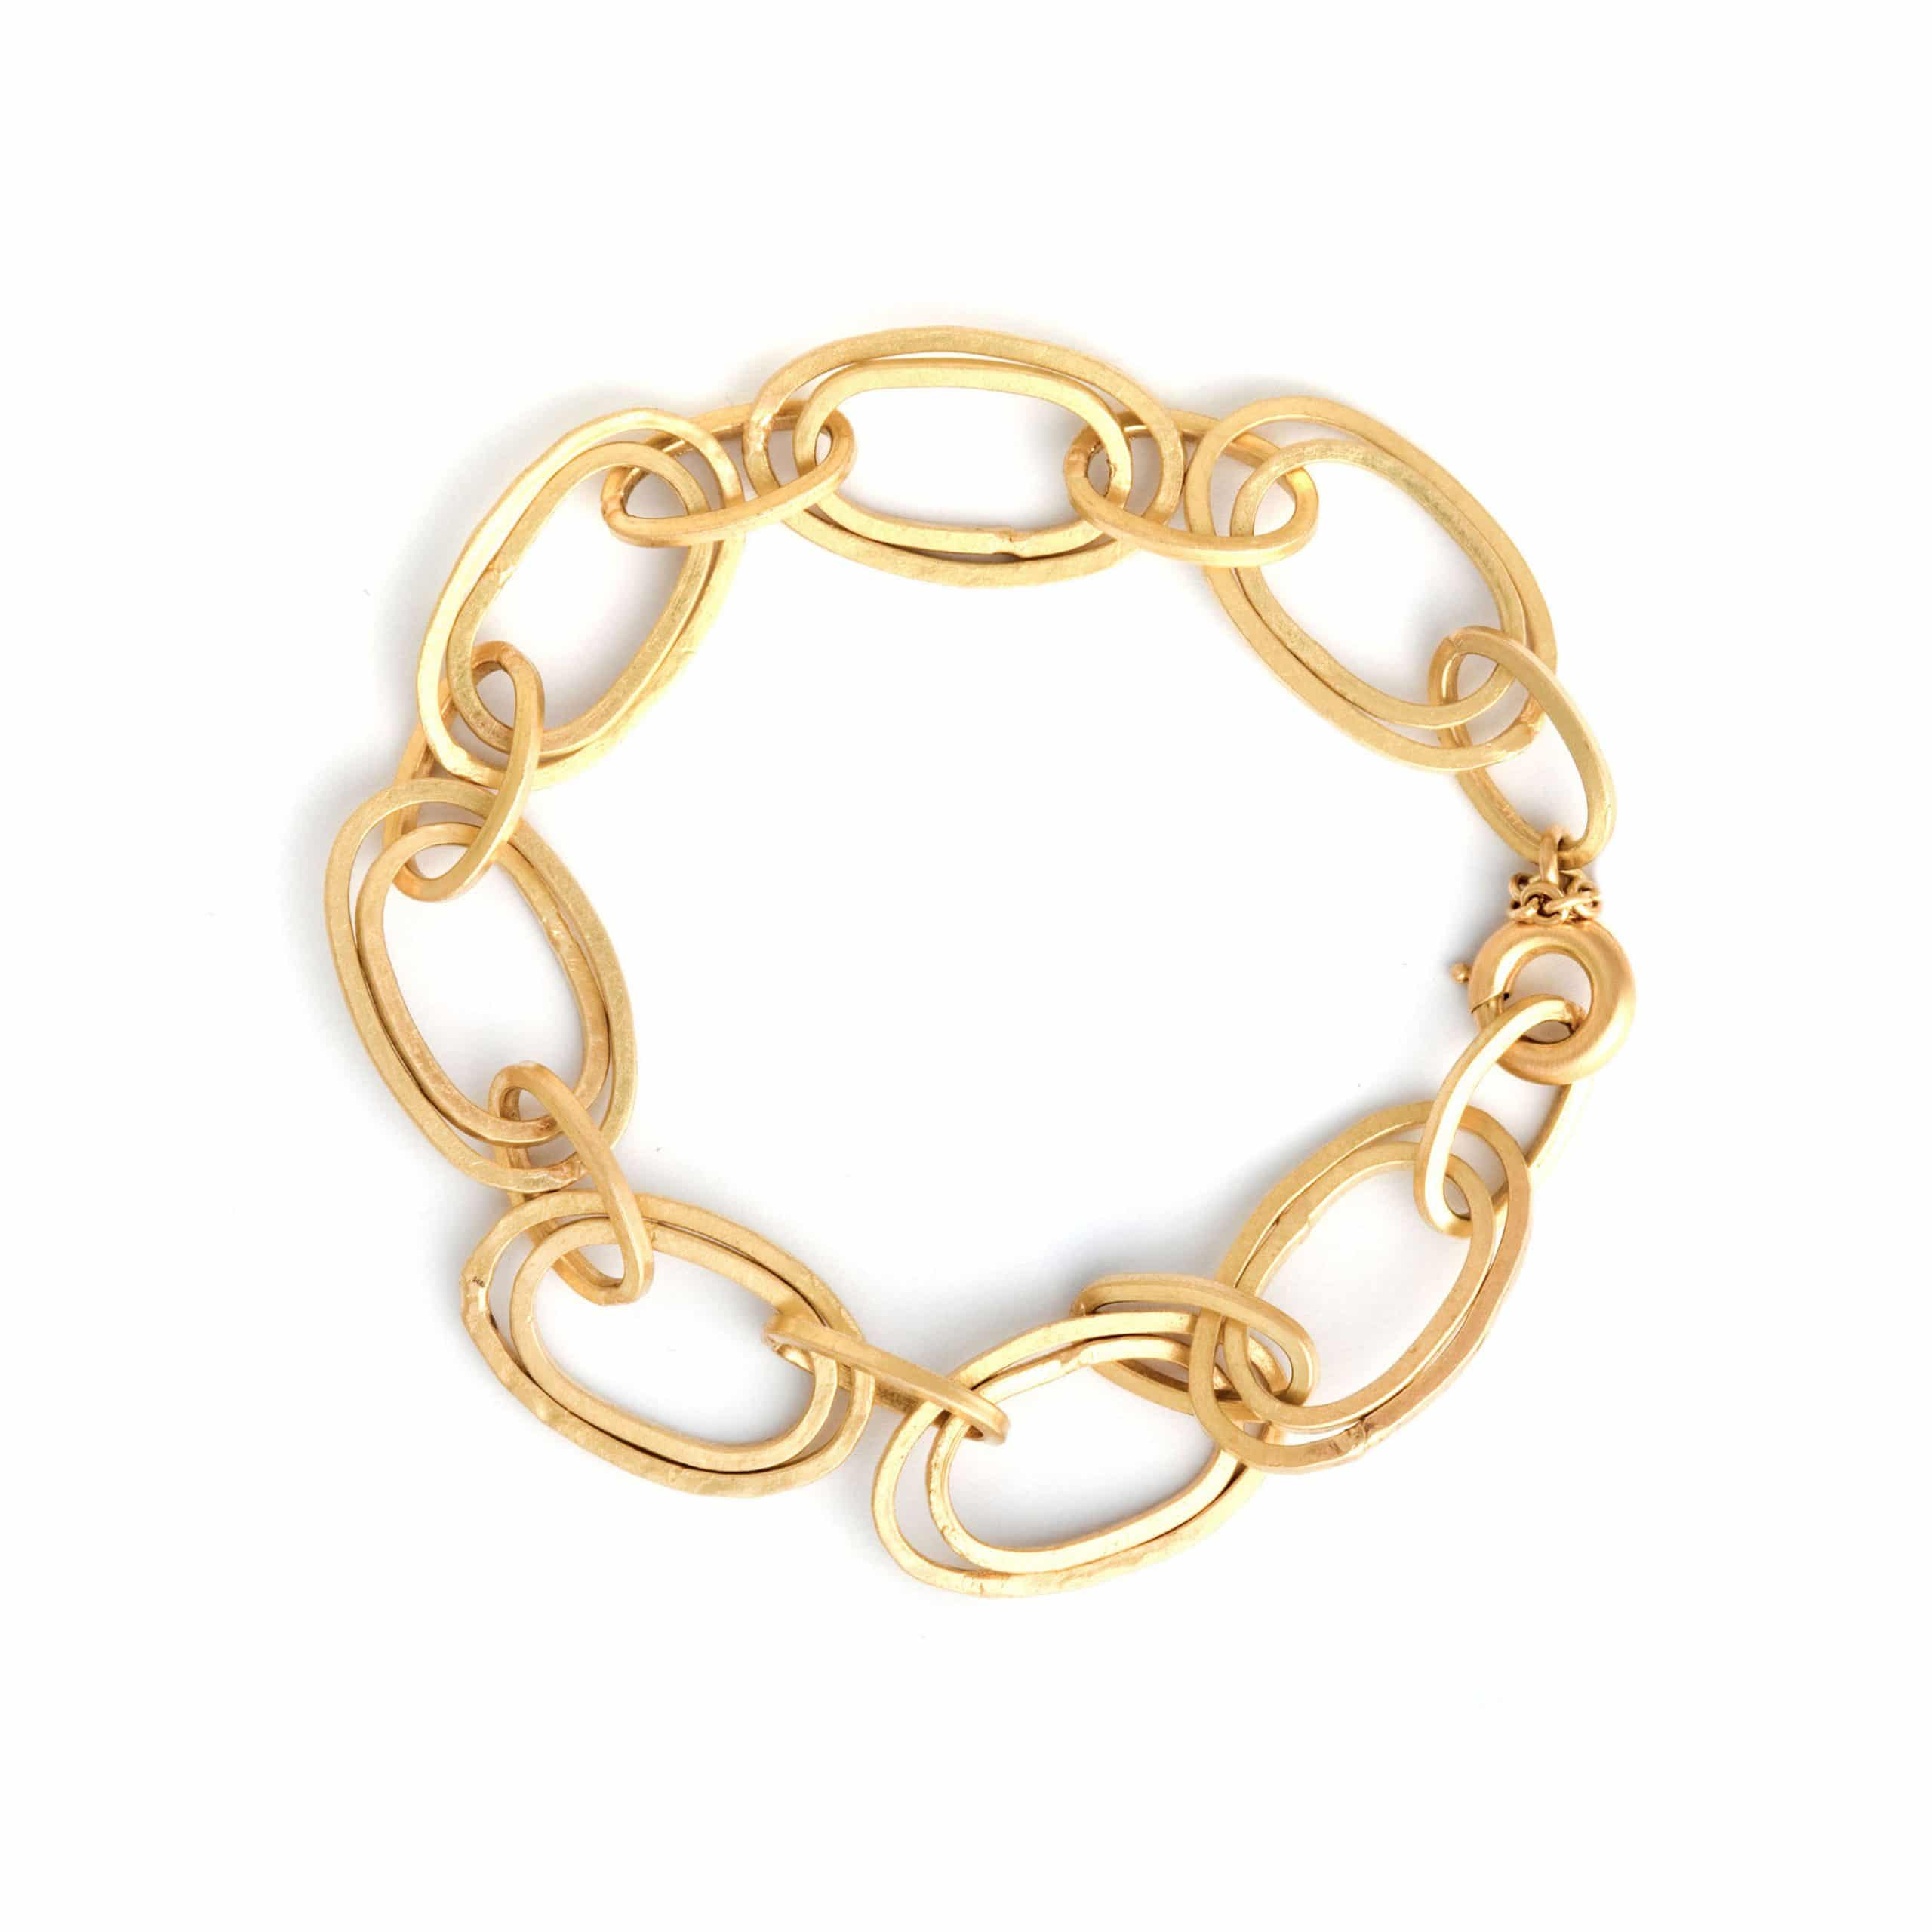 Bracelet anneaux or